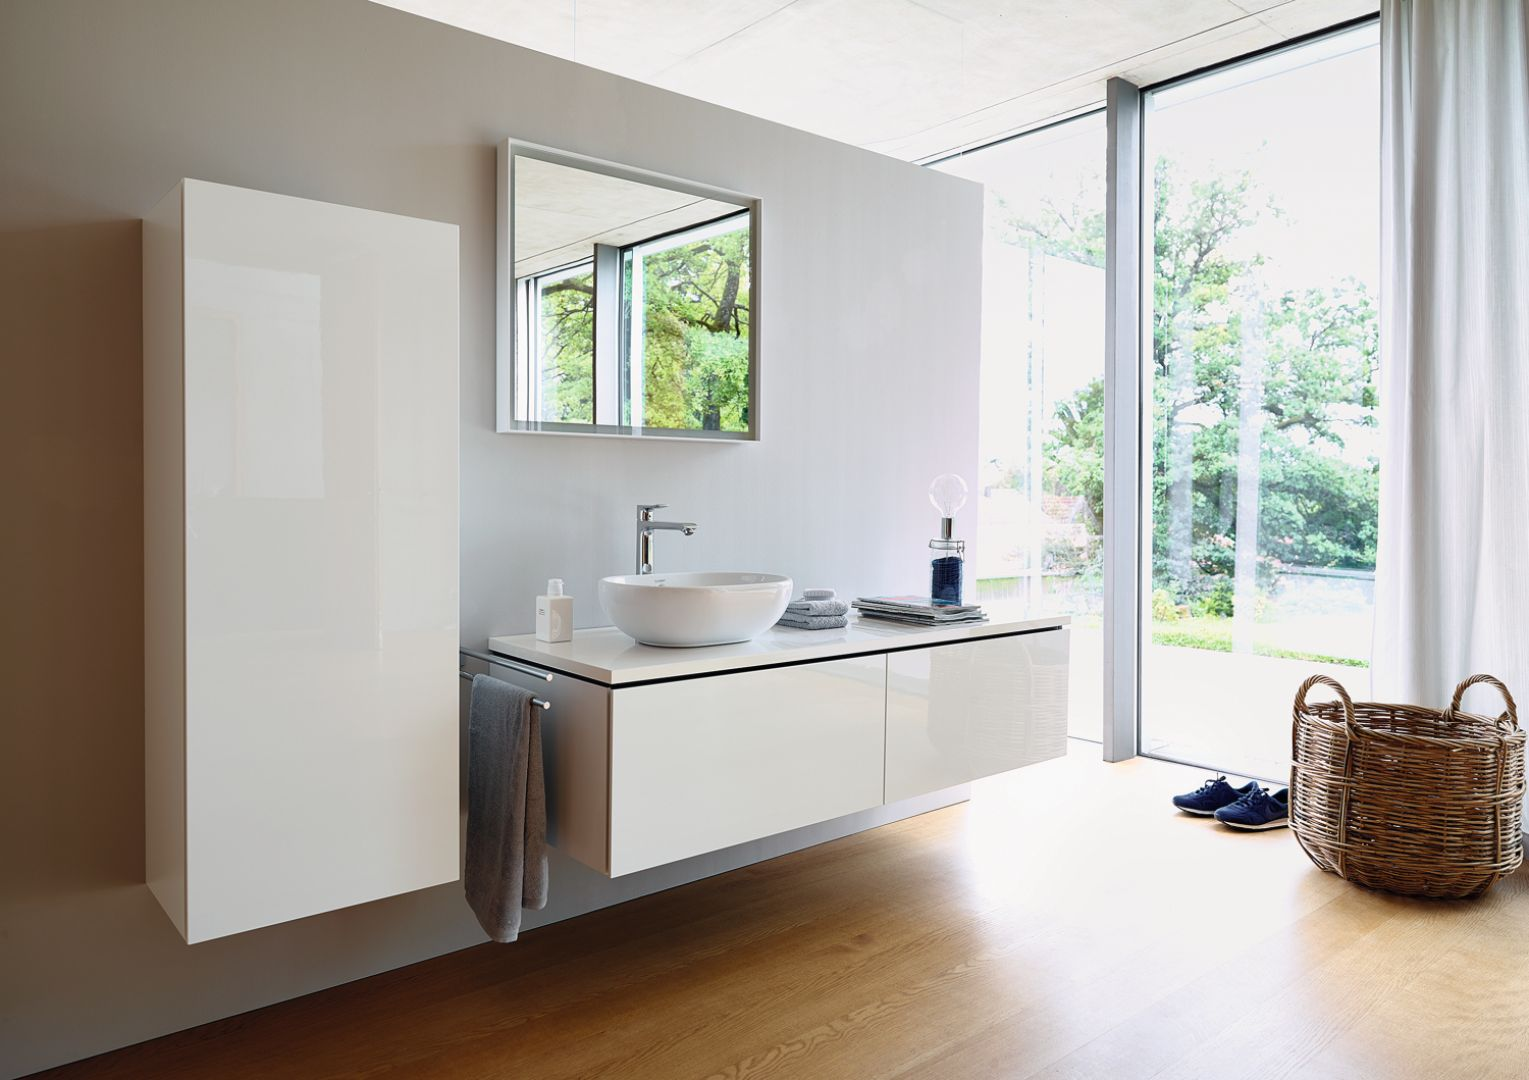 Białe meble łazienkowe z serii L-Cube marki Duravit. Fot. Duravit